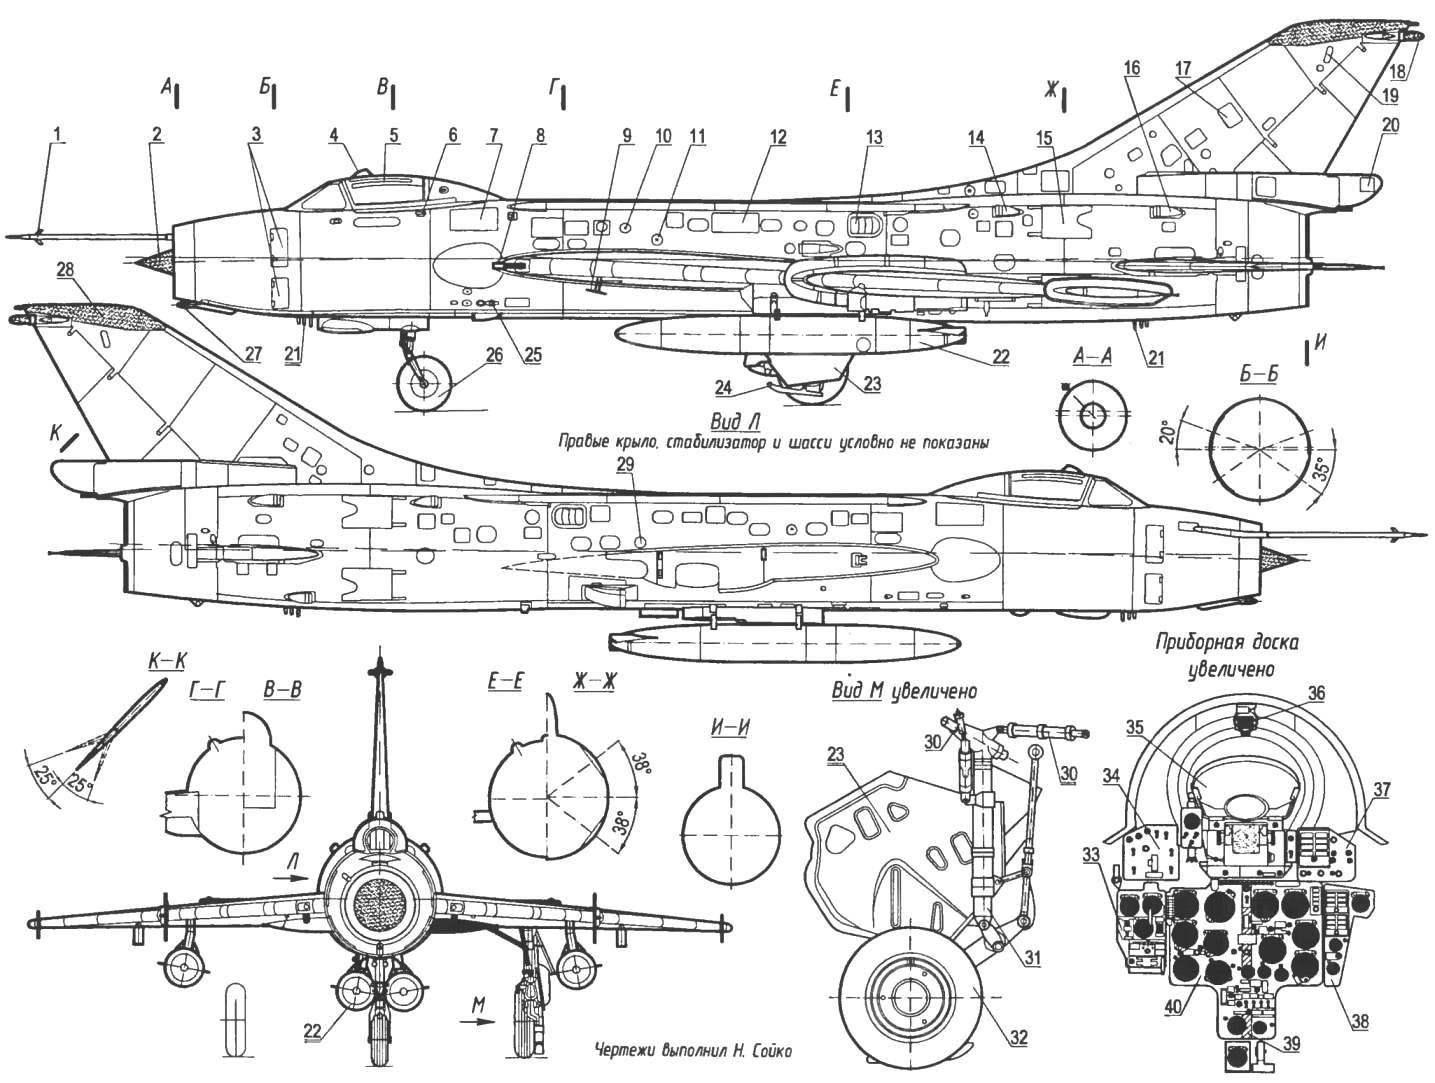 Истребитель-бомбардировщик Су-7БКЛ